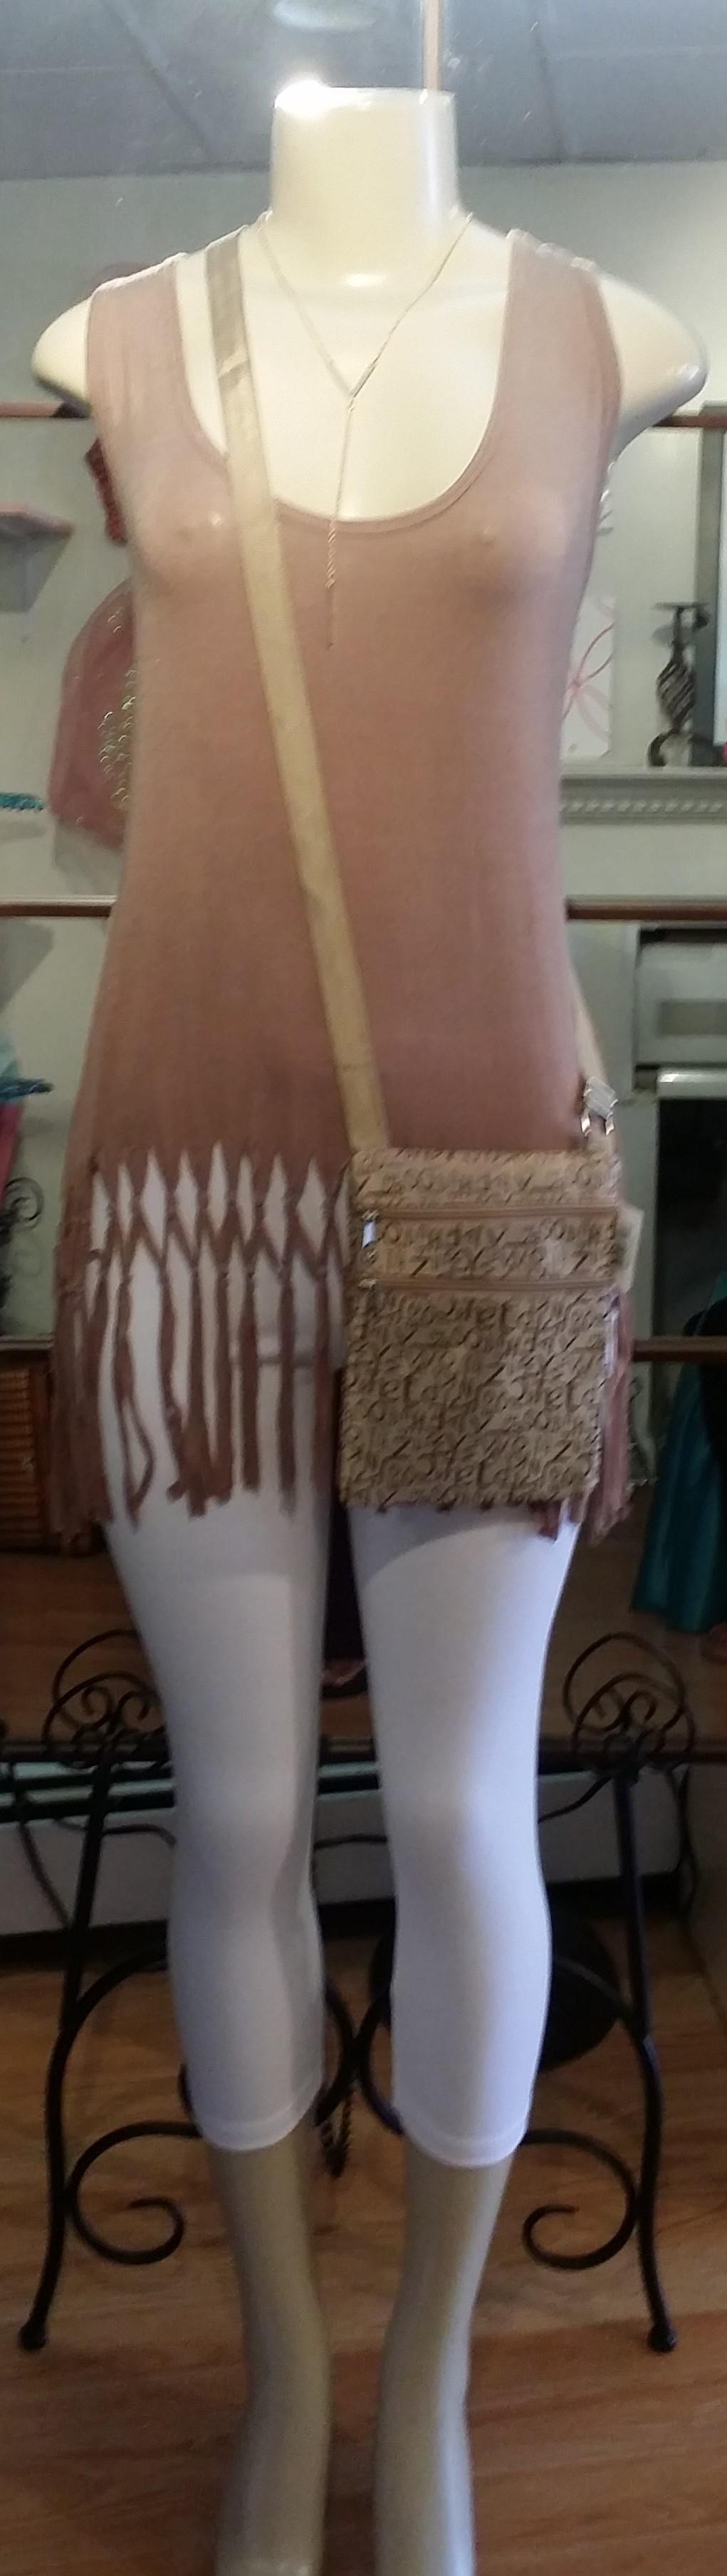 Taupe top-white leggings